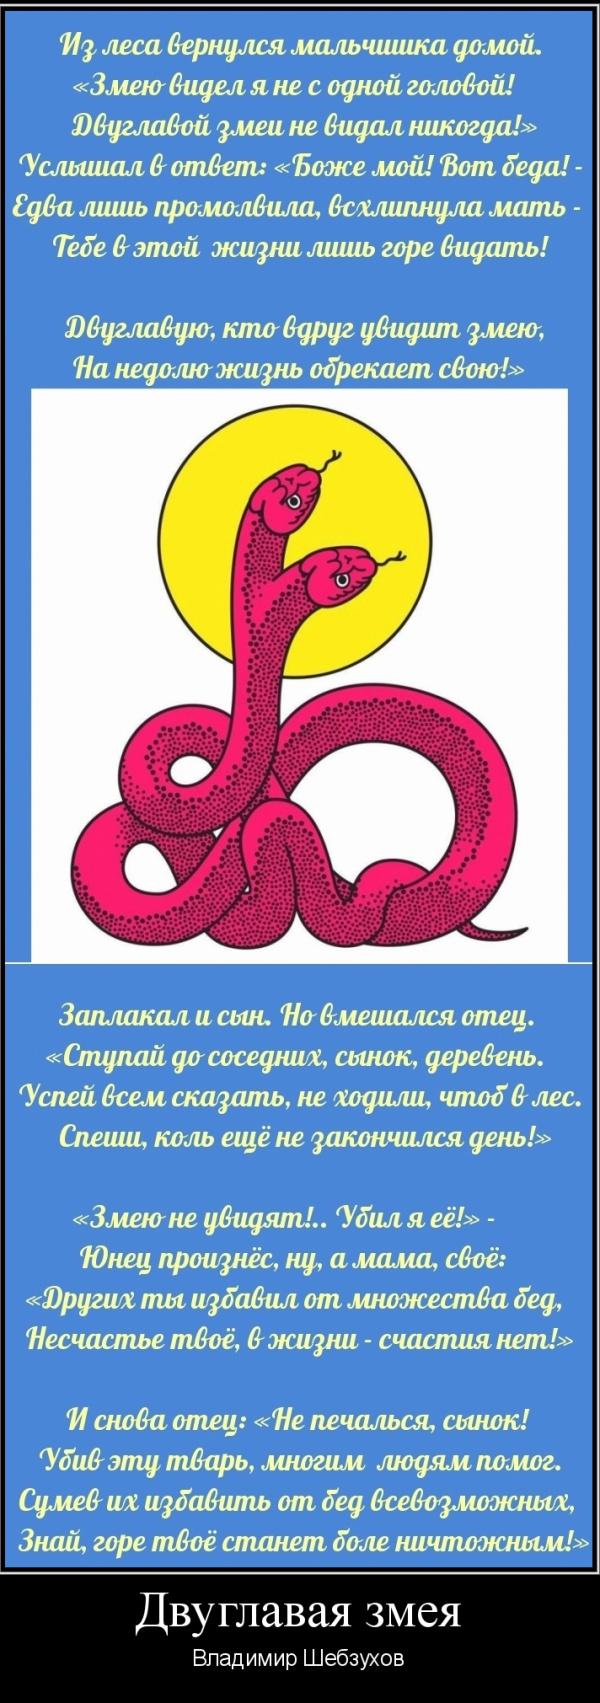 Владимир Шебзухов Притчи  - Страница 47 Eec10